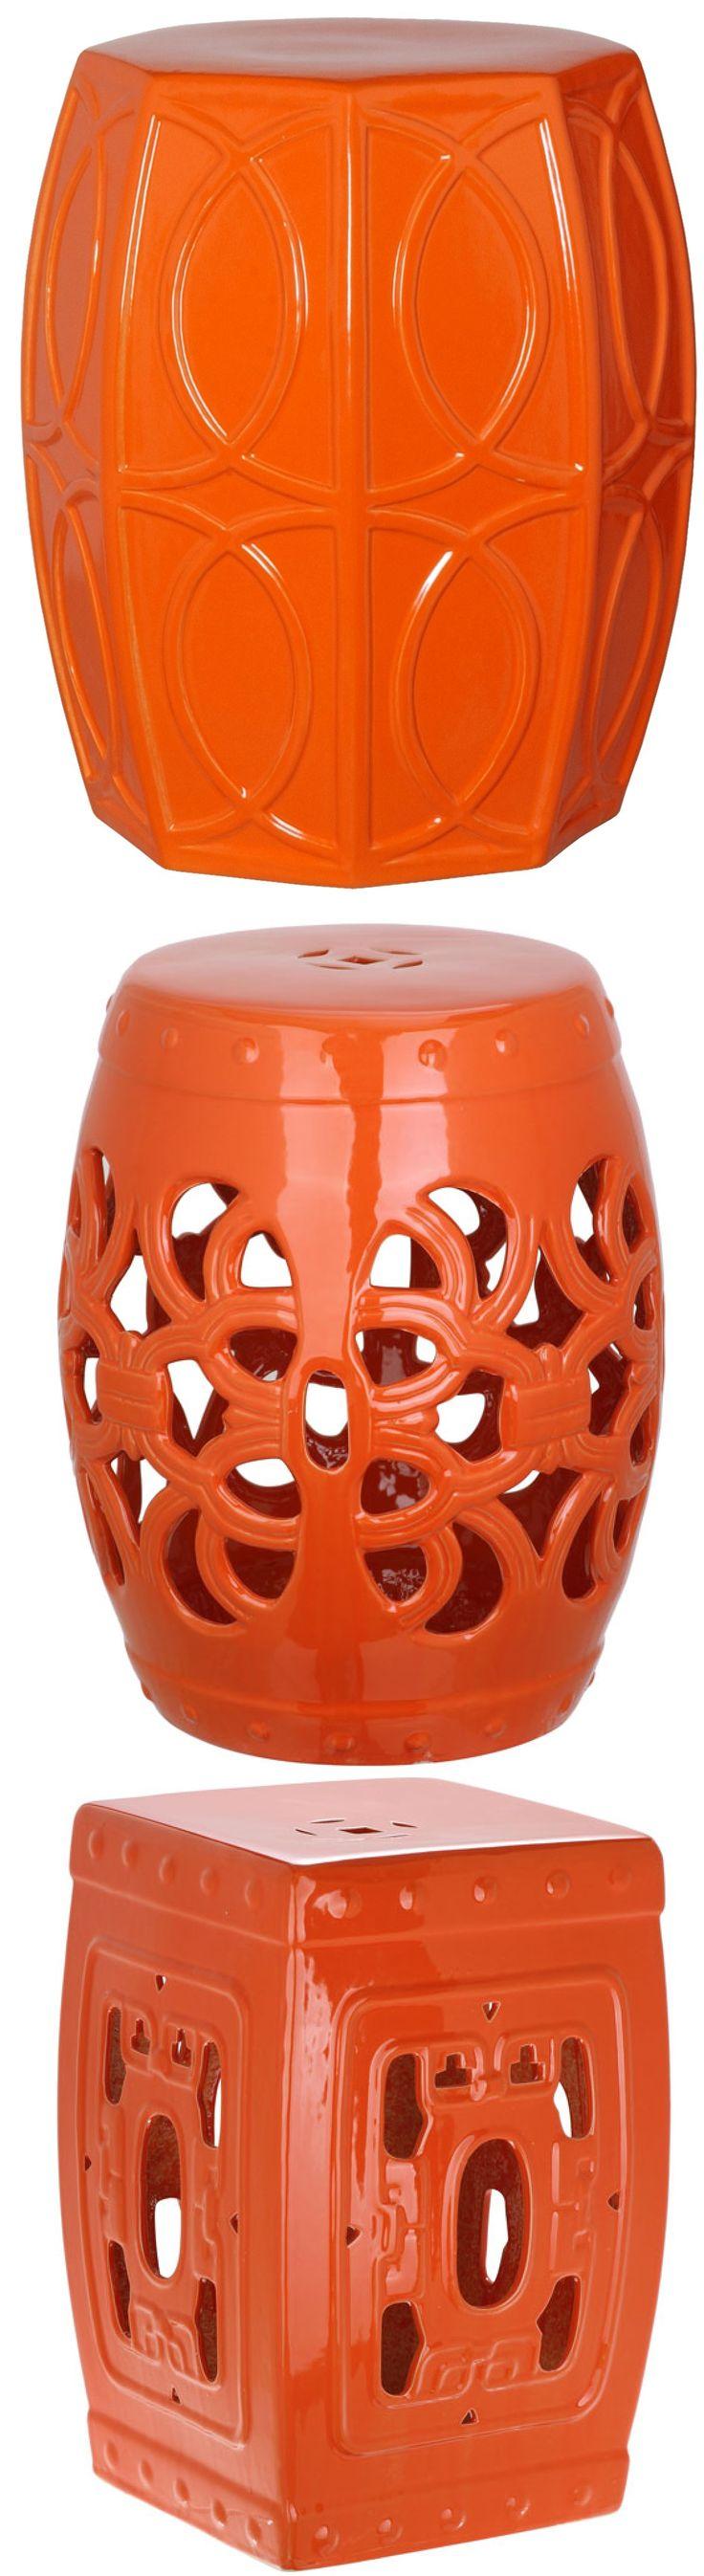 Orange Garden Stool | Orange Ceramic Stools | Orange Porcelain Stool | Orange Ceramic Stool | Orange Porcelain Stools | Orange Pottery Stool | Orange Pottery Stools | Orange Garden Stools | Garden Stool | Garden Stools | Garden Stools | Ceramic Stool | Chinese Garden Stools | Ceramic Stools | Chinese Garden Stool | InStyle Decor Hollywood Largest On Line Collection of Color Arranged Ceramic Stools Over 1,000 Stool Designs View www.instyle-decor.com/orange-garden-stools.html Worldwide…